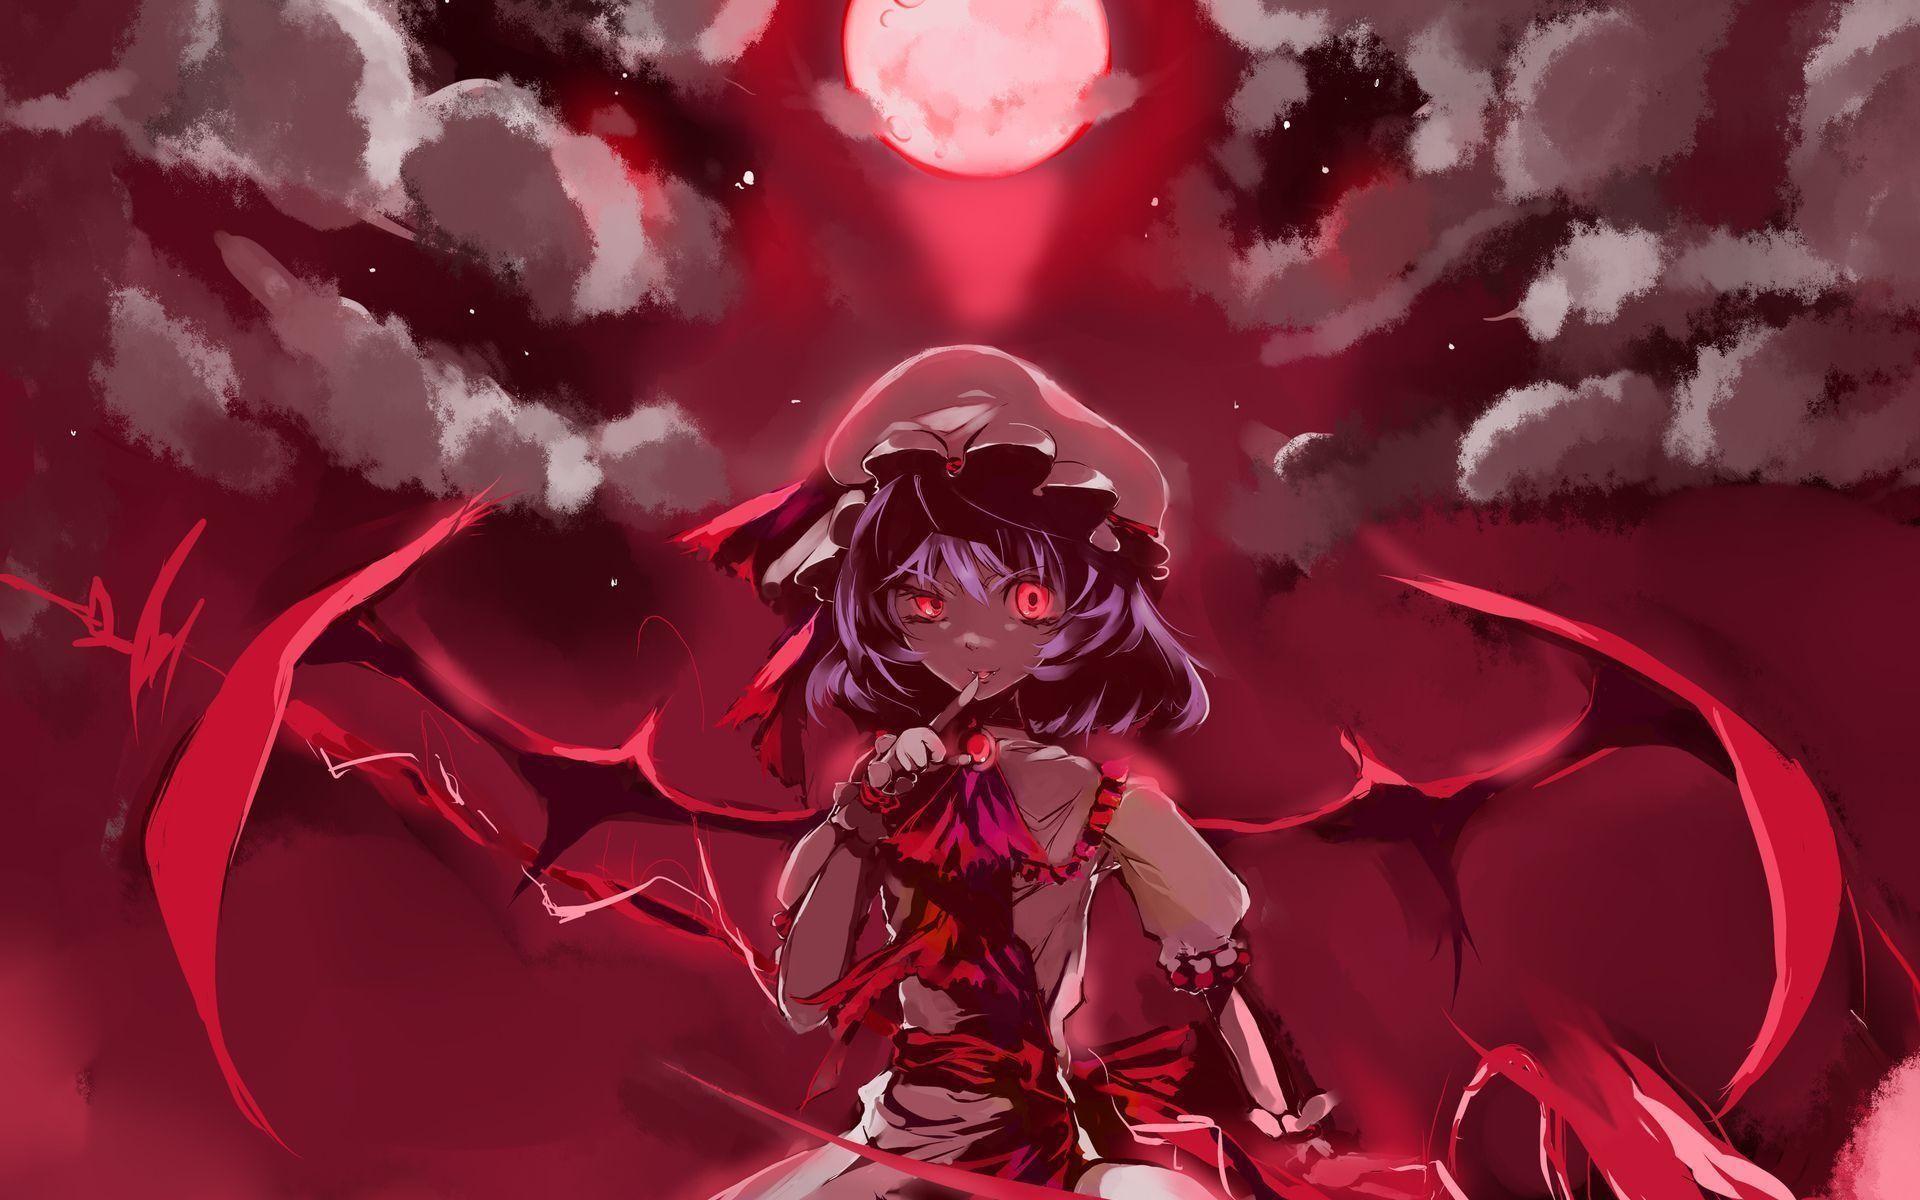 Anime Vampire Girl Wallpaper Id #1064 | Frenzia.